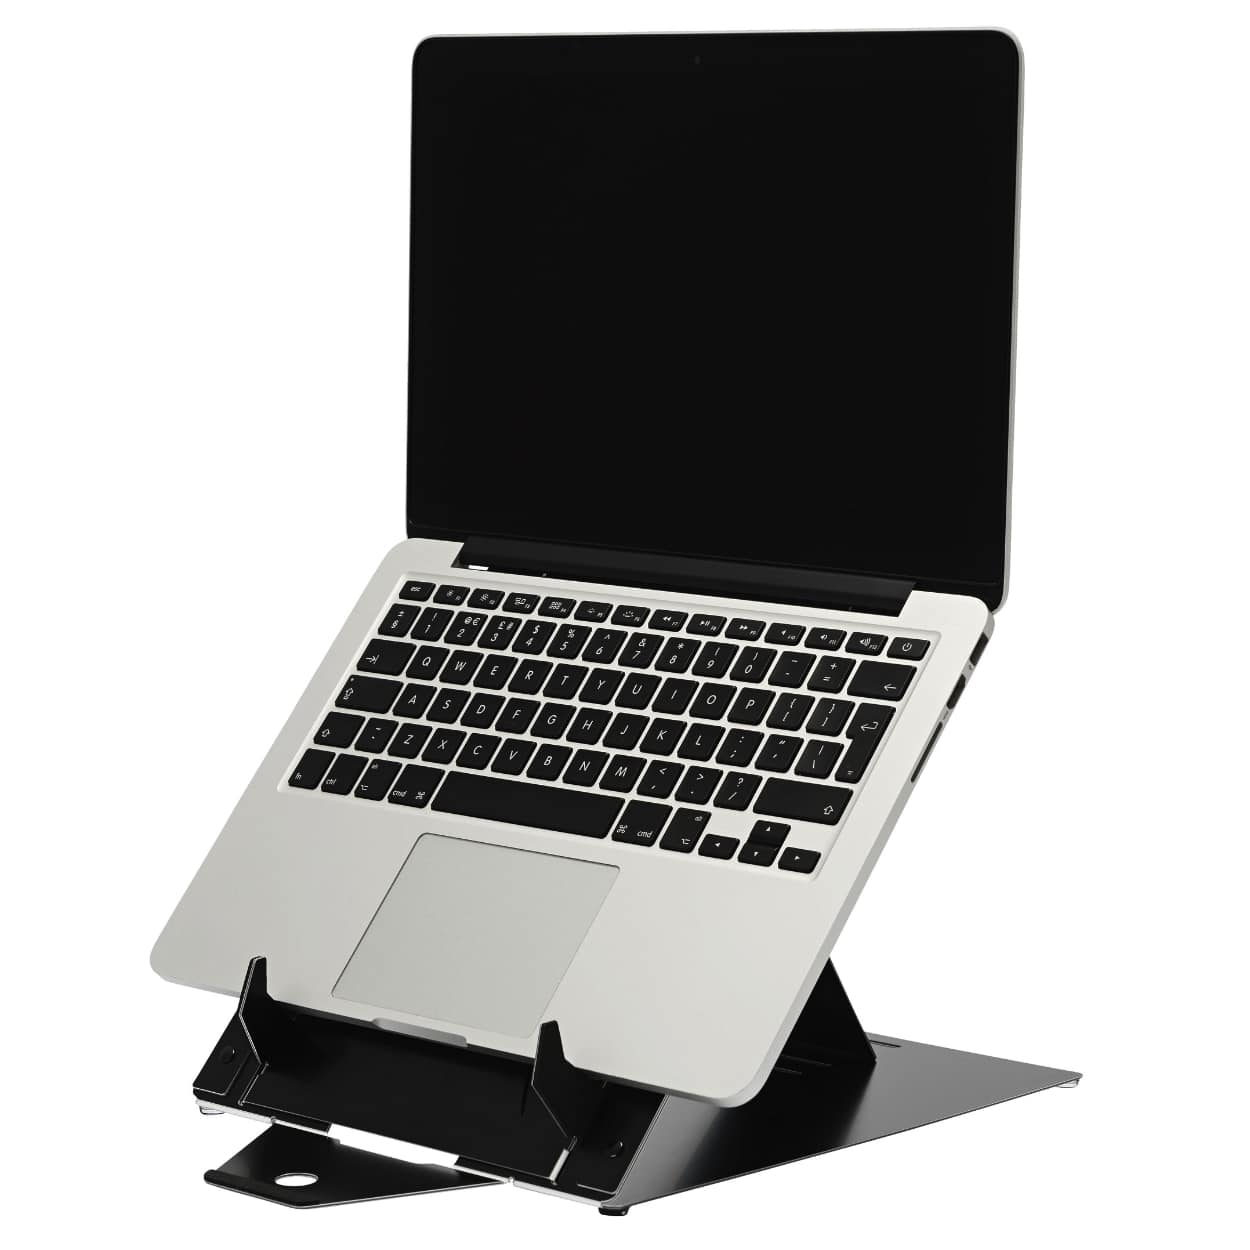 R-Go Riser Duo laptopstandaard